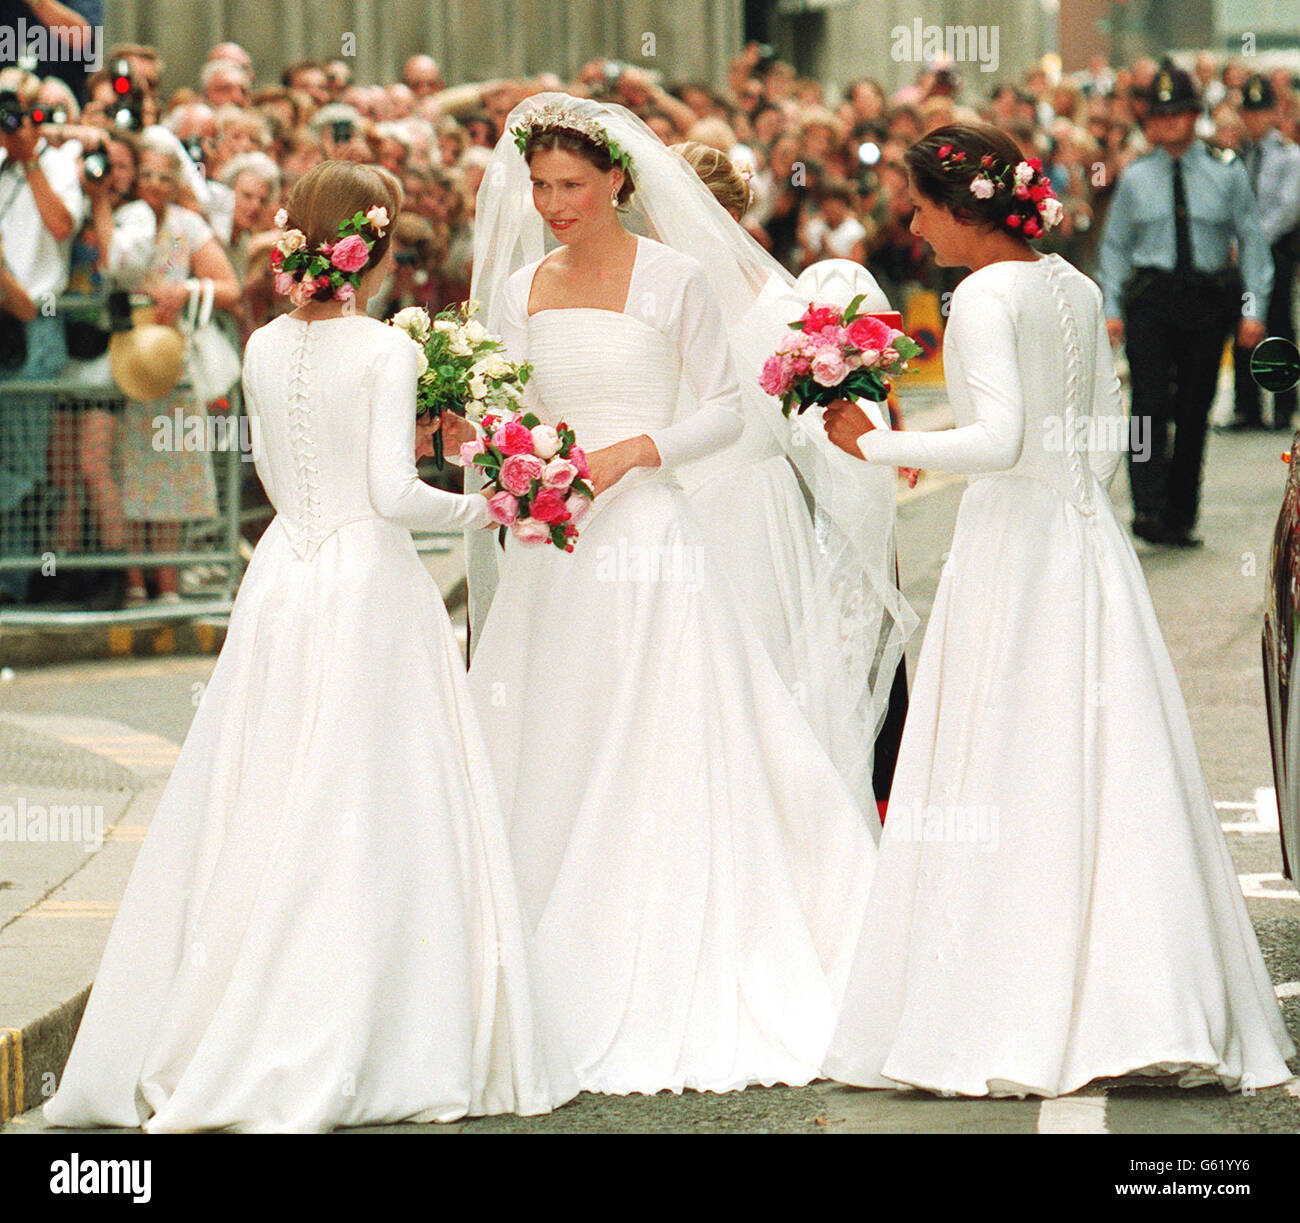 St Brides Ring